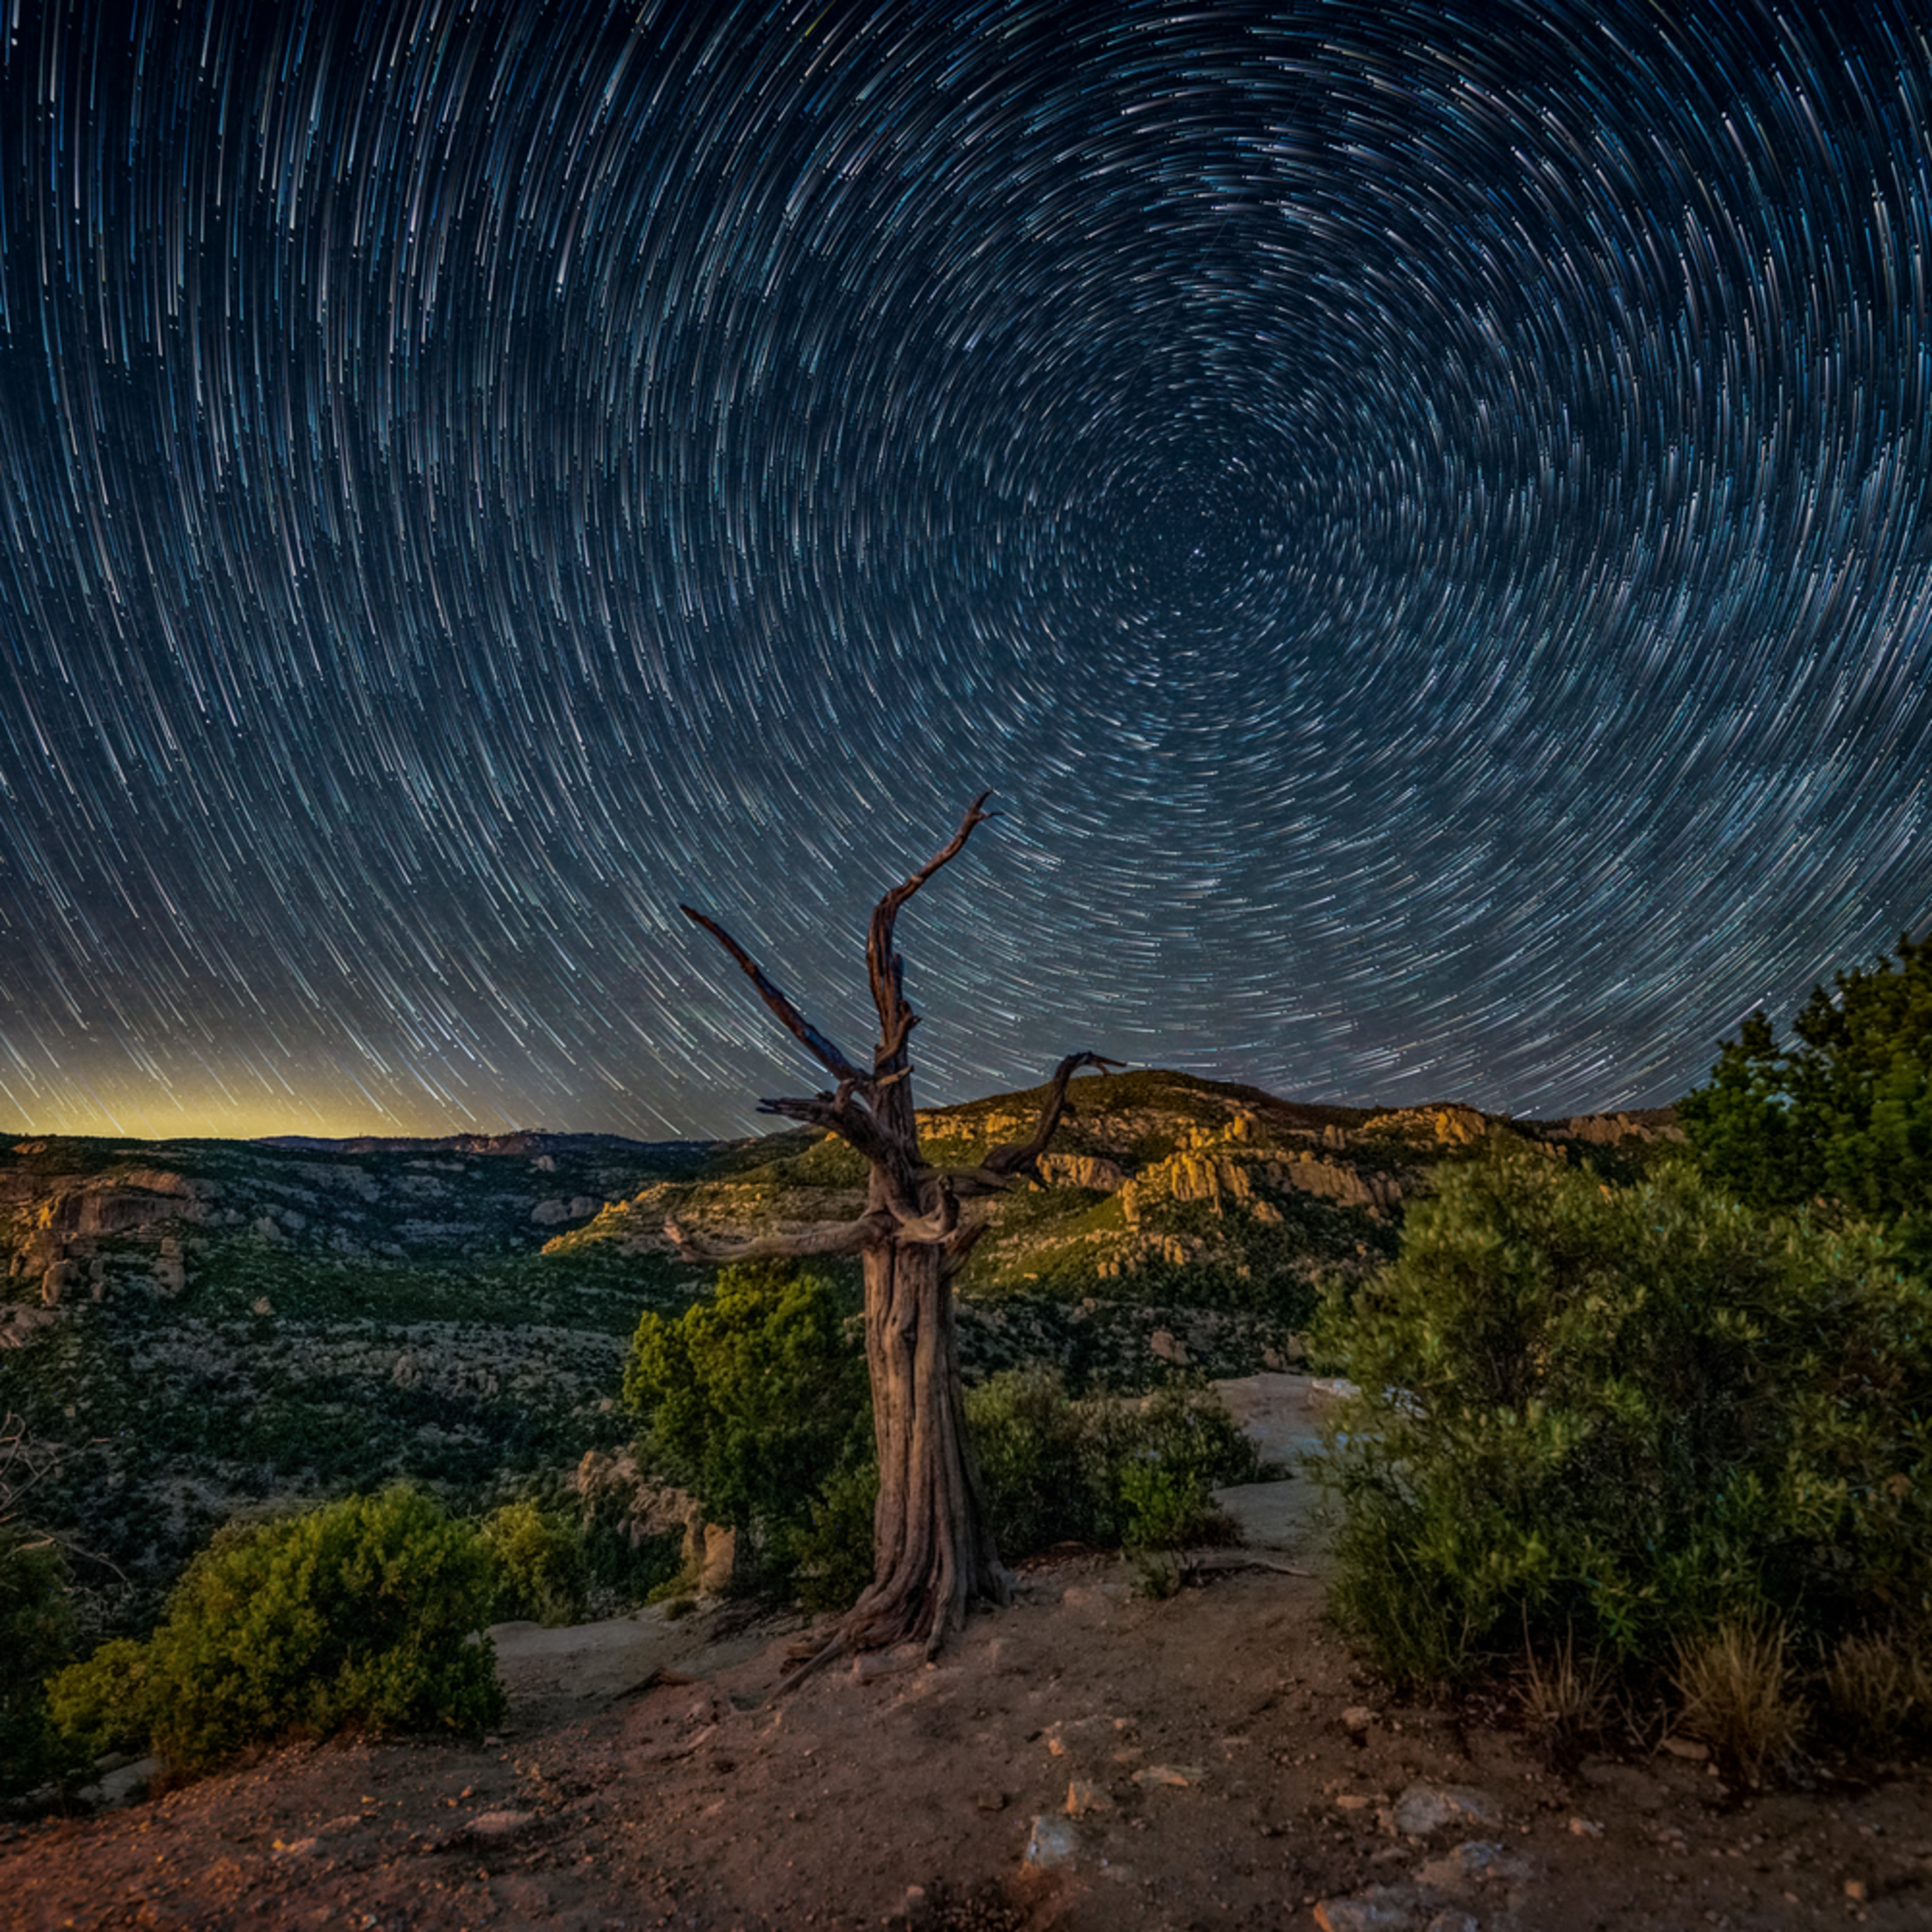 Mount lemmon windy point 2019 05 24 021 star trails with dead tree x6kuxd